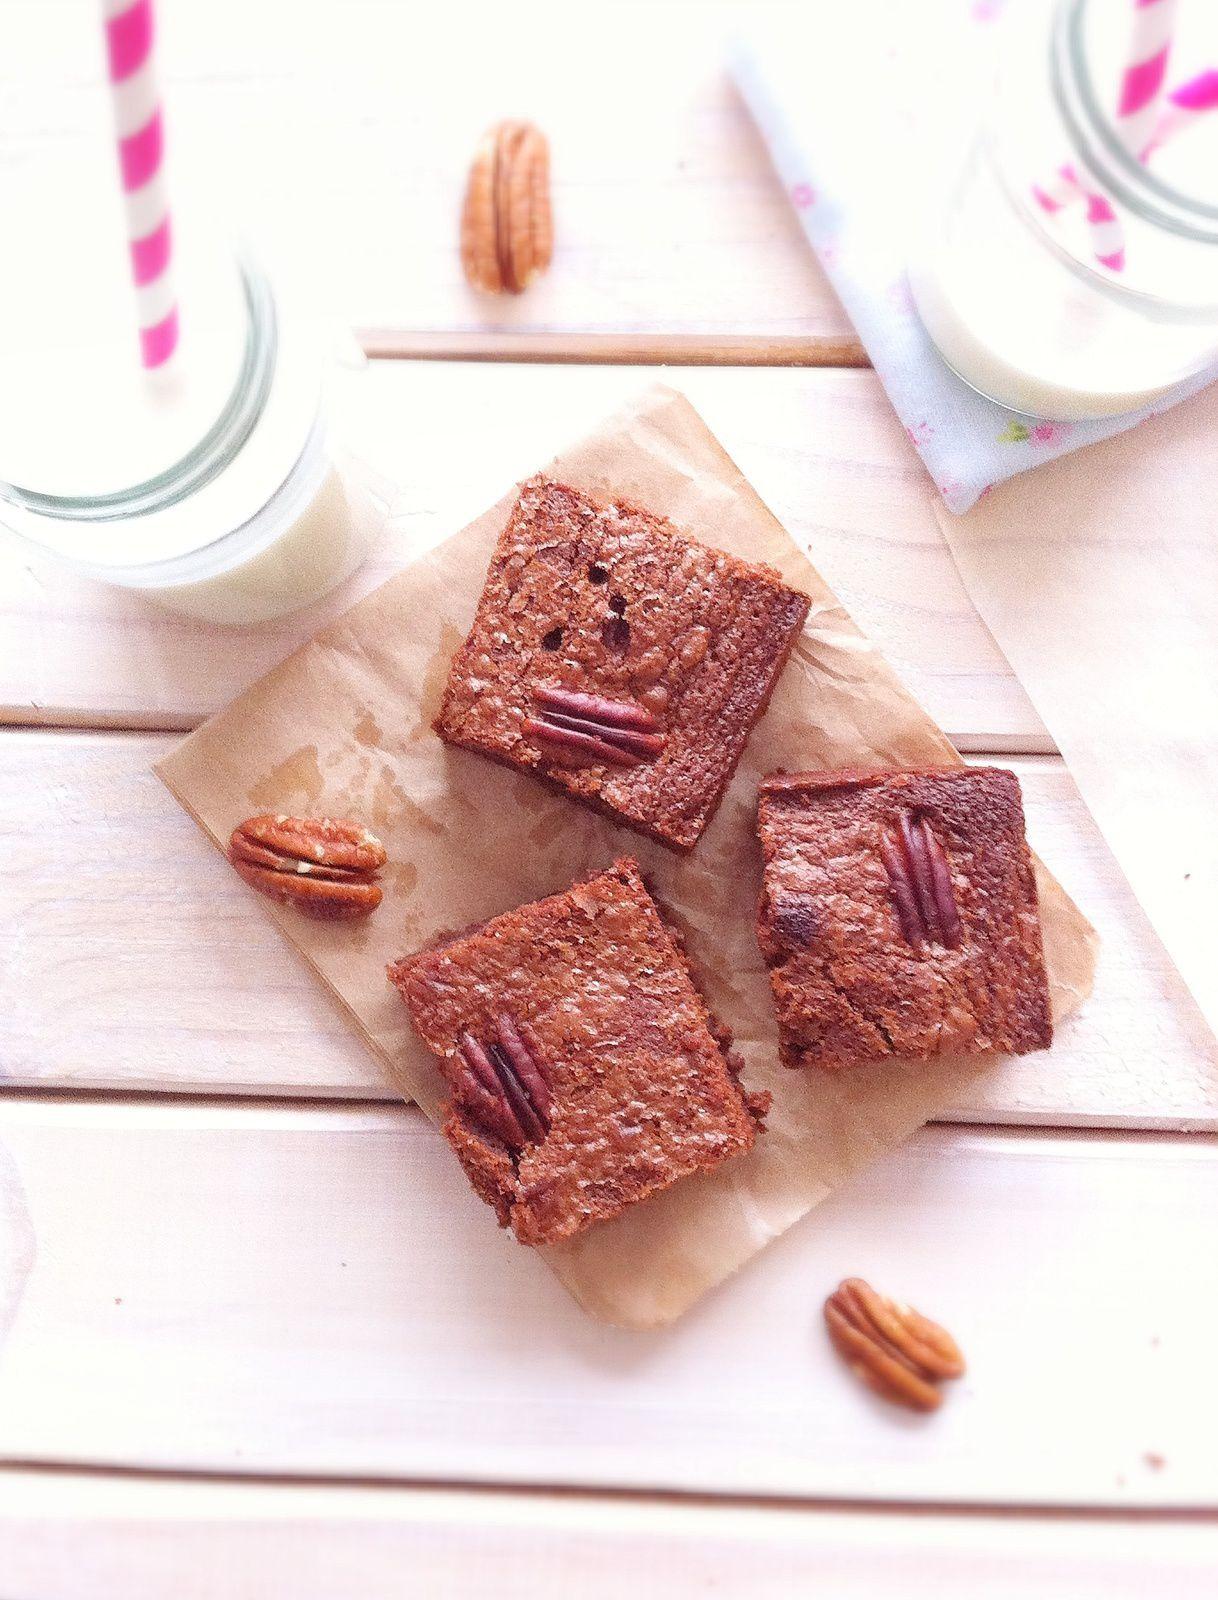 Le meilleure Brownie au monde